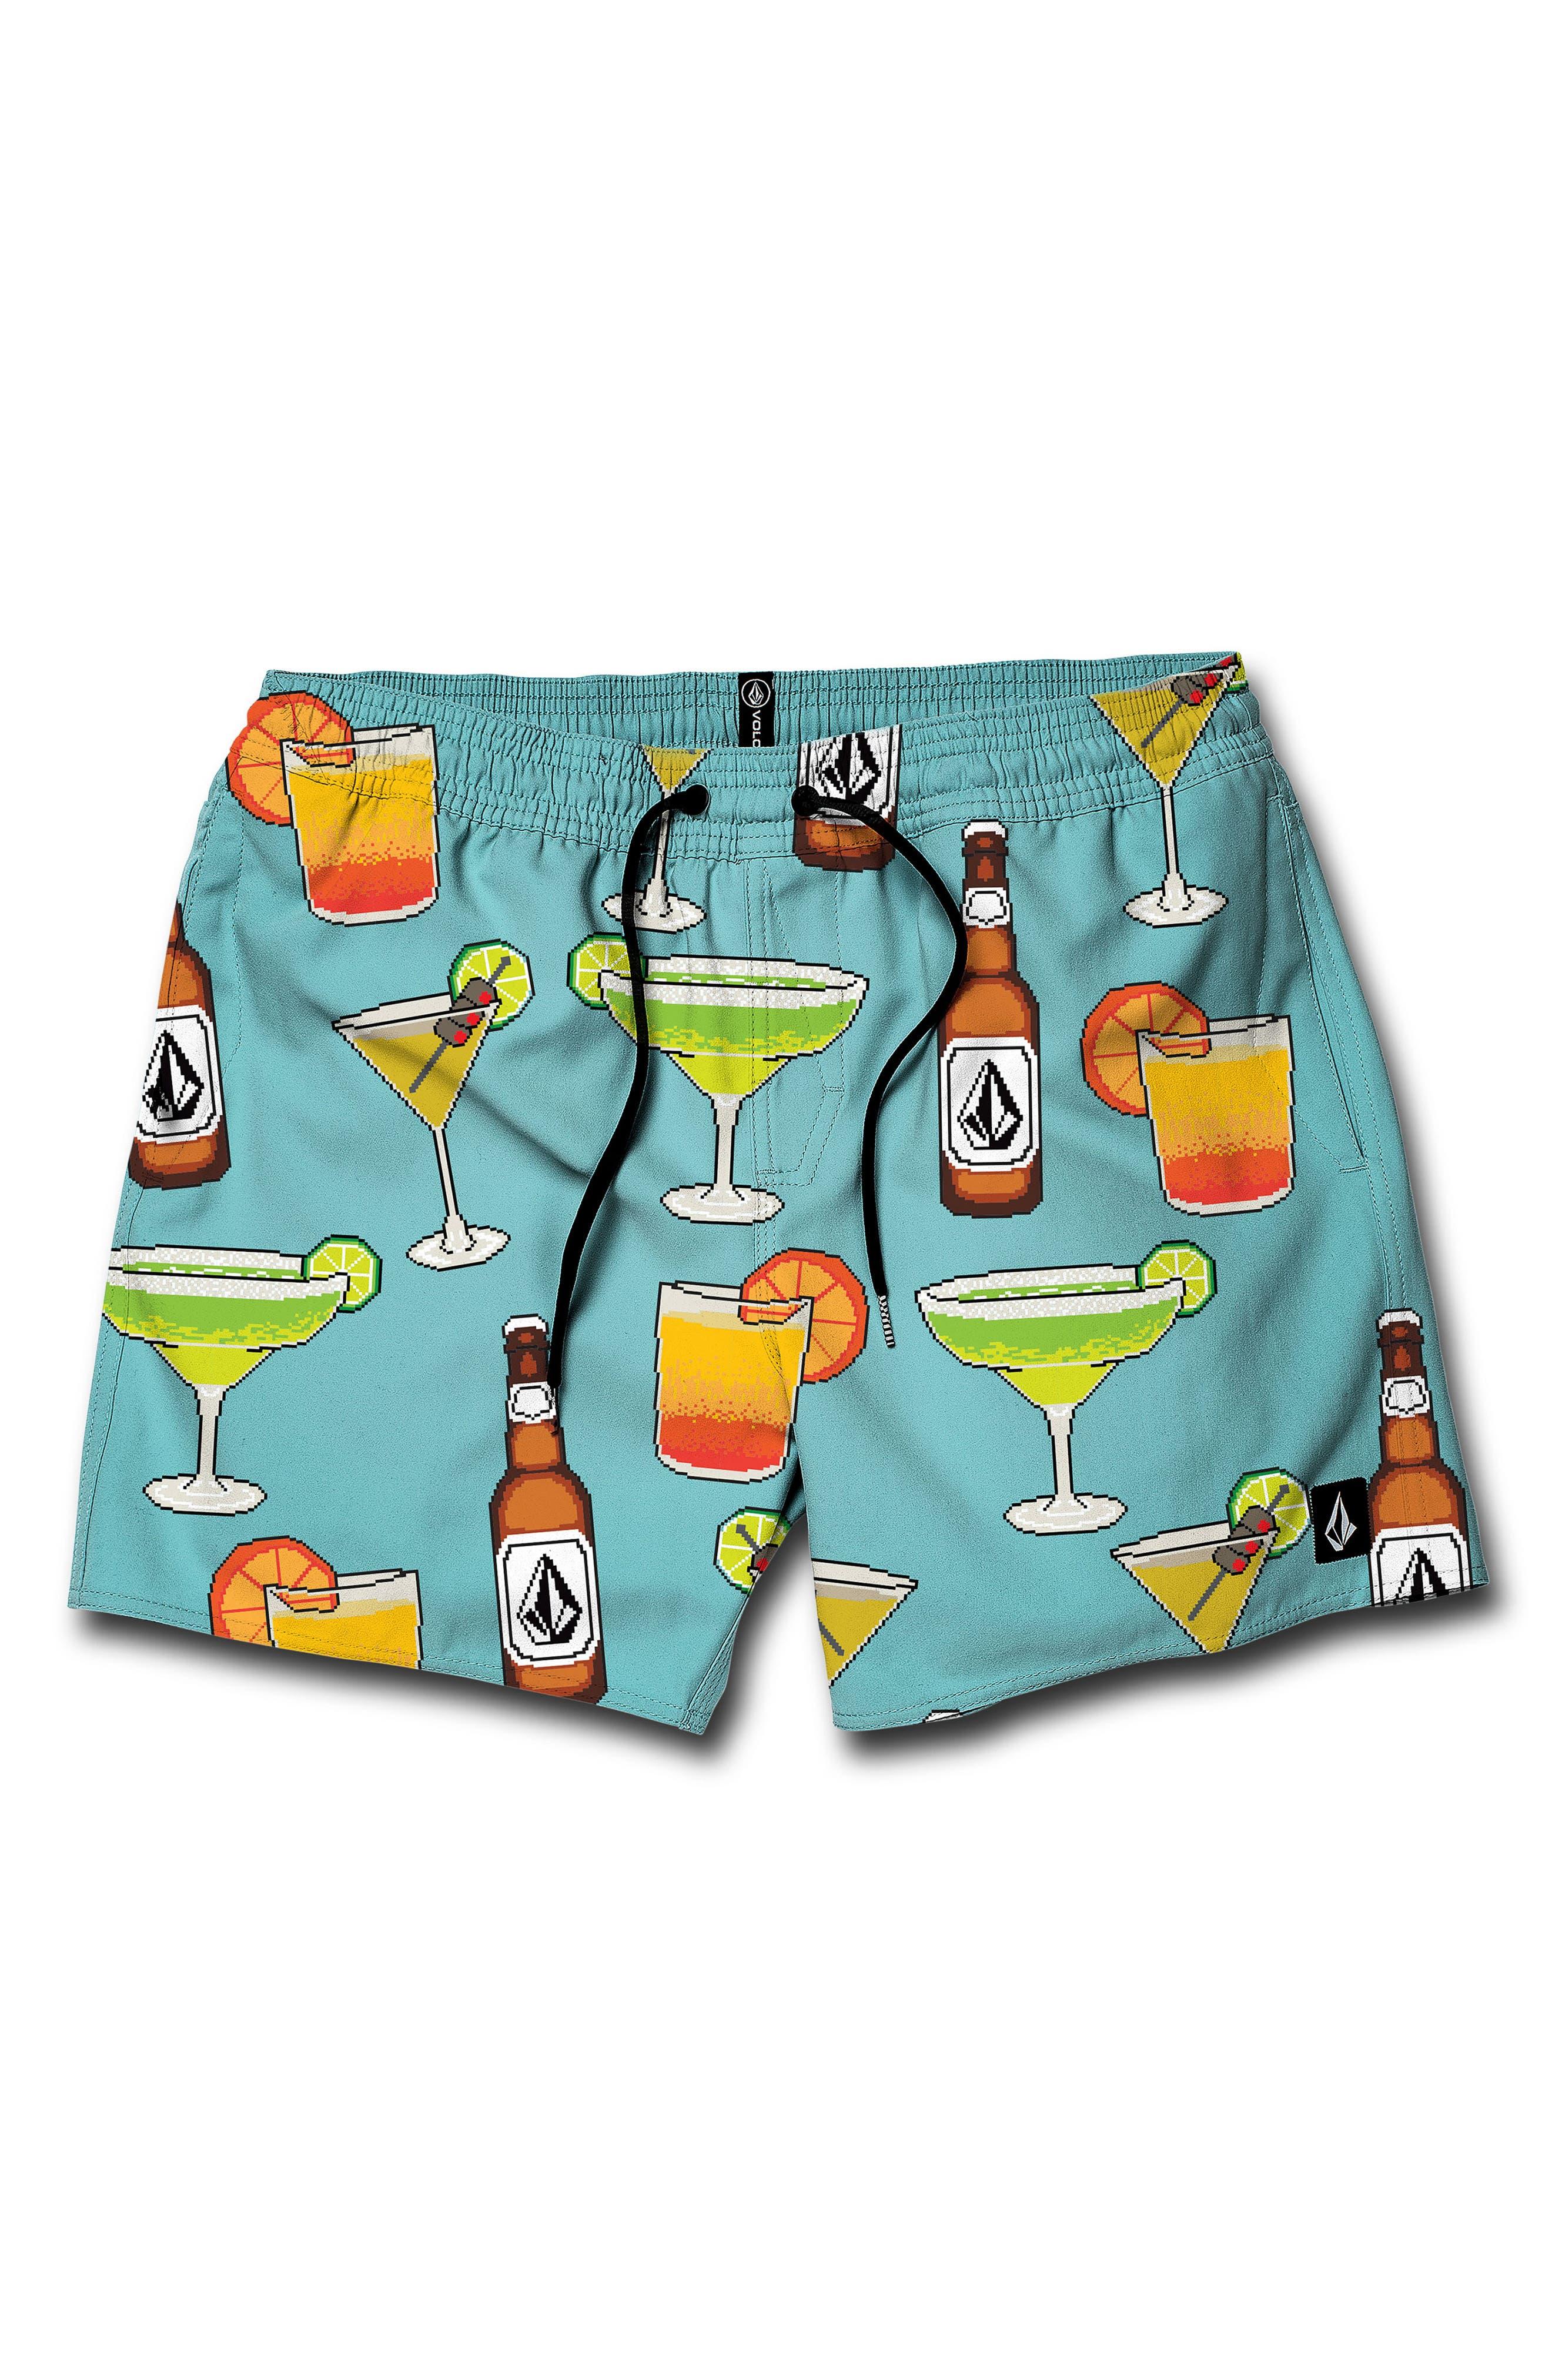 8 Bit Swim Trunks, Main, color, TUR